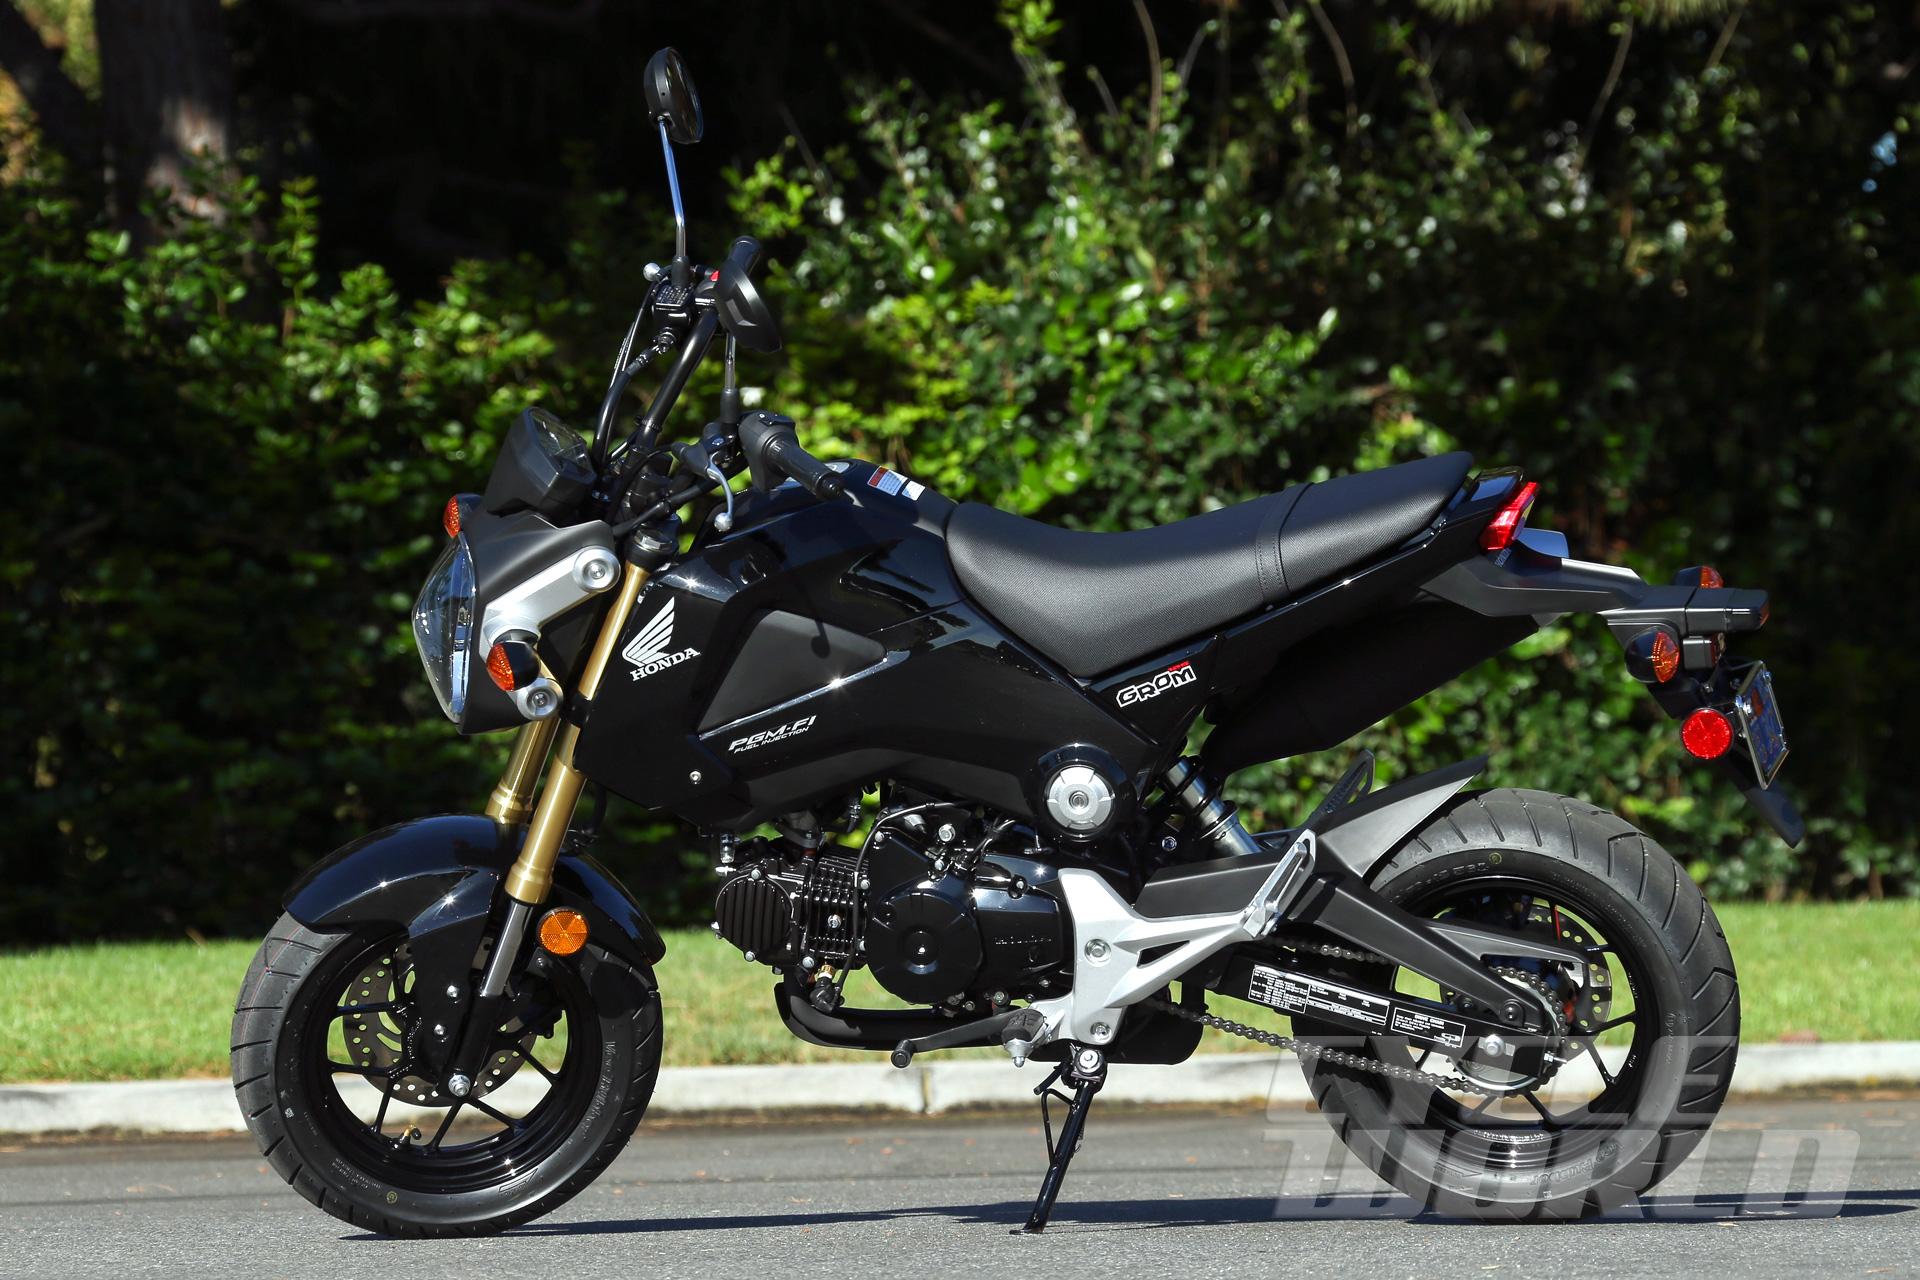 Honda Grom Bike Review- Photos- Specifications- Dyno Run